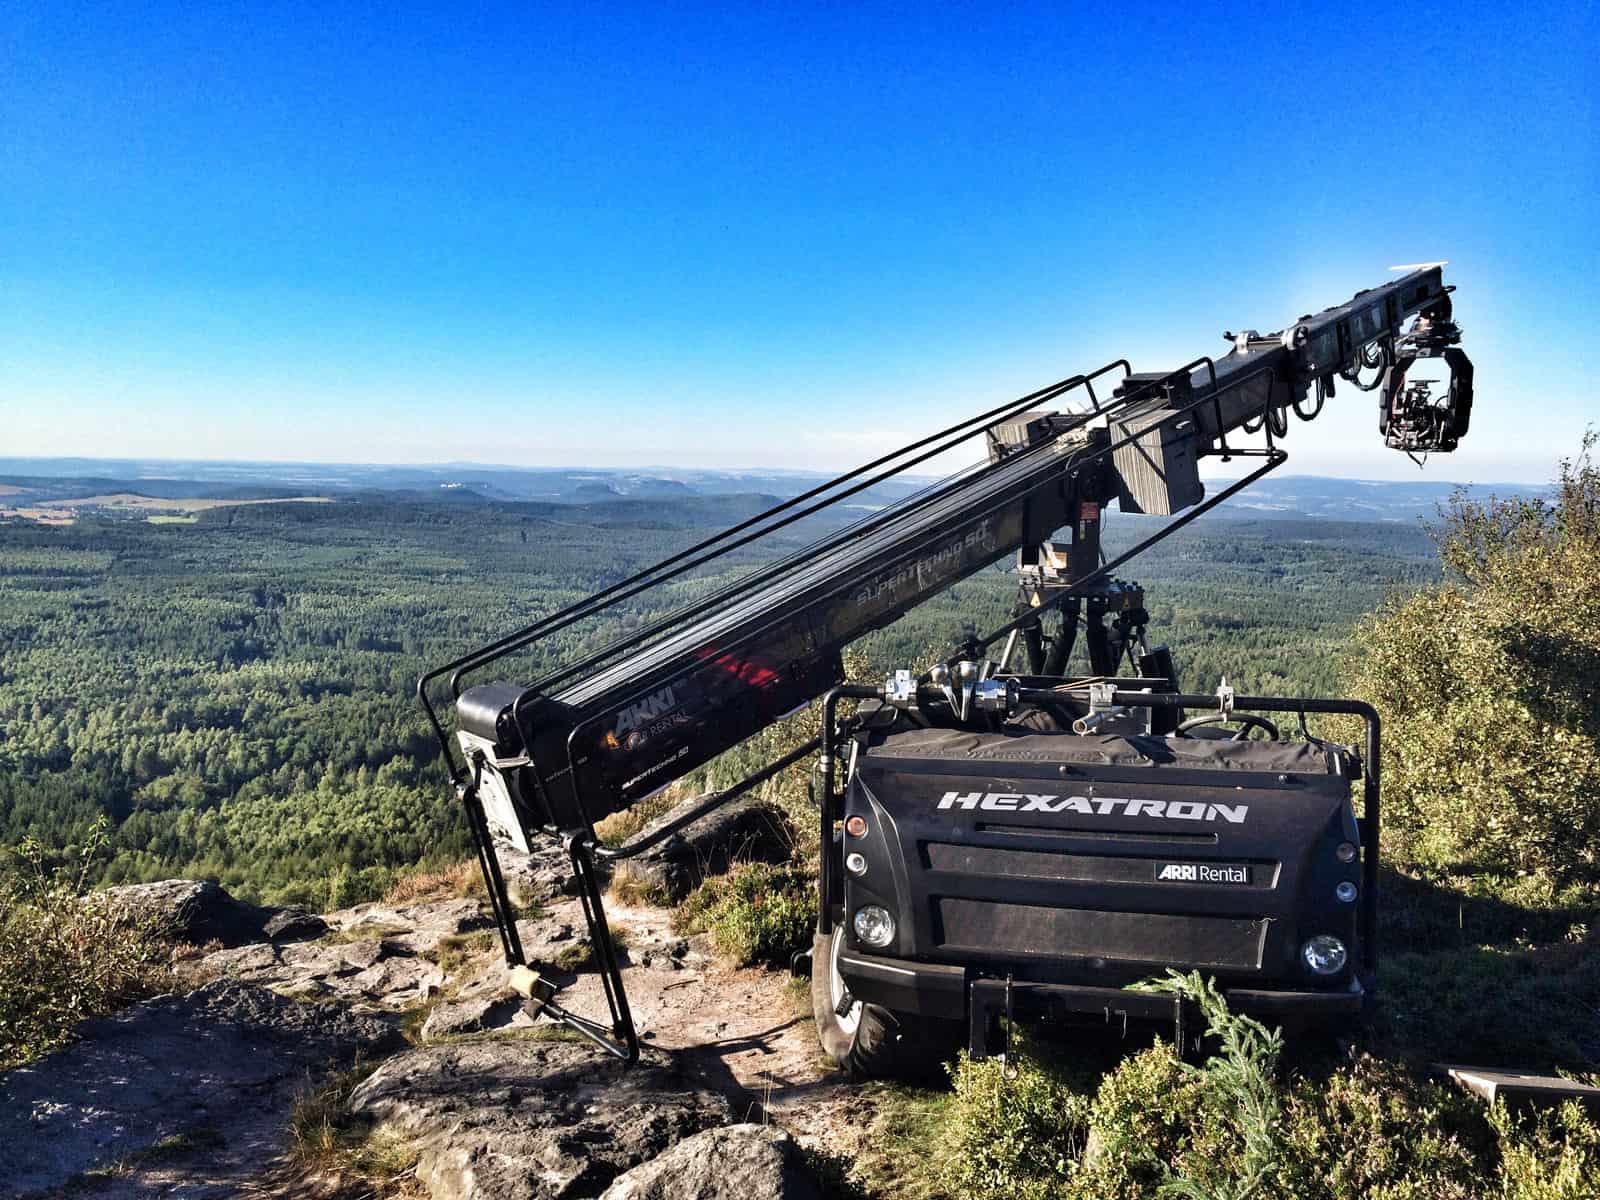 ARRI Hexatron off-road crane positioning system